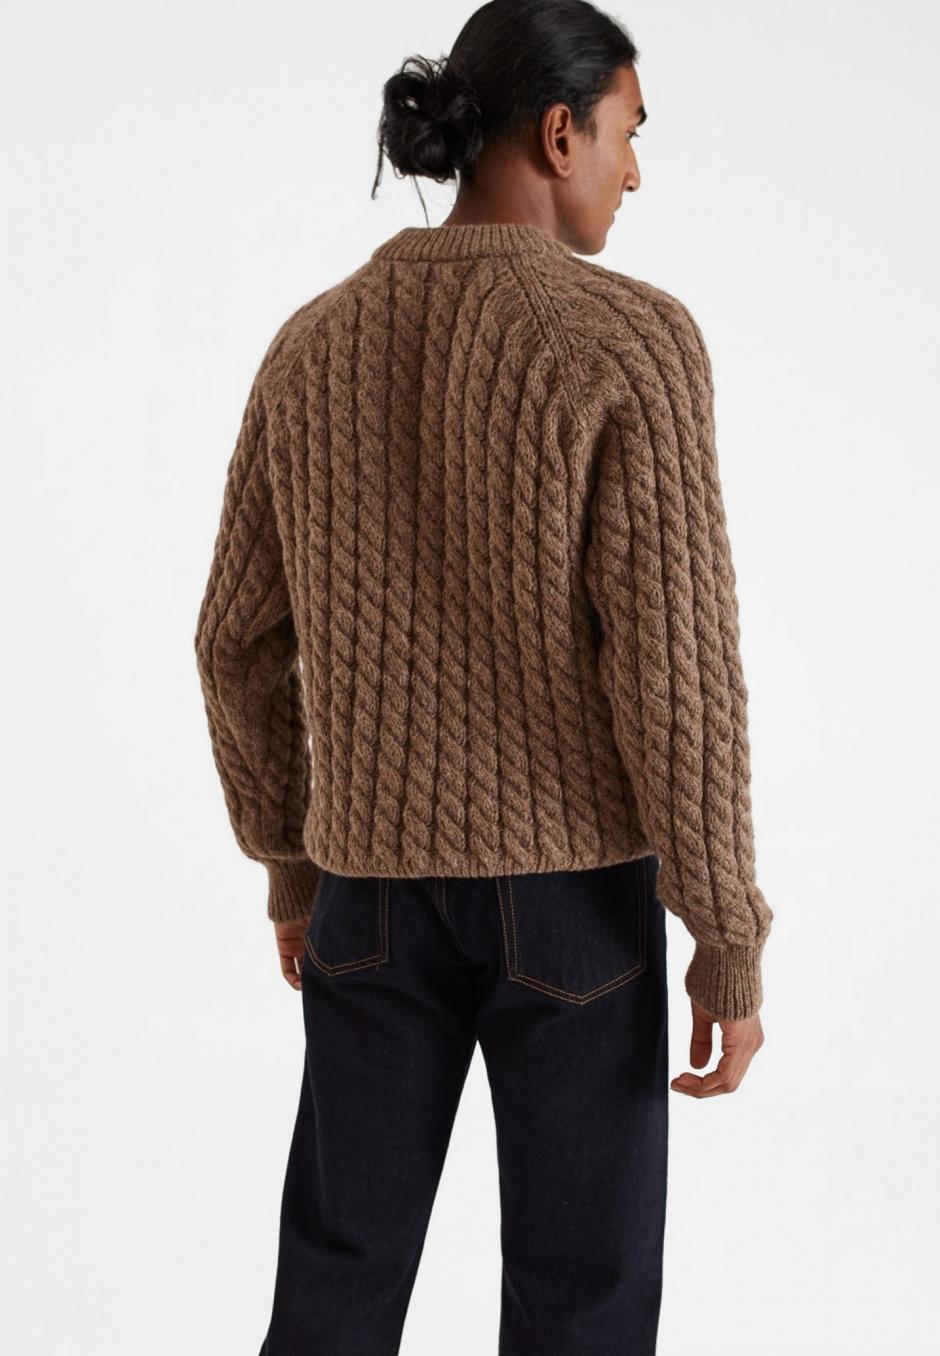 Séfr Rambaldi Sweater